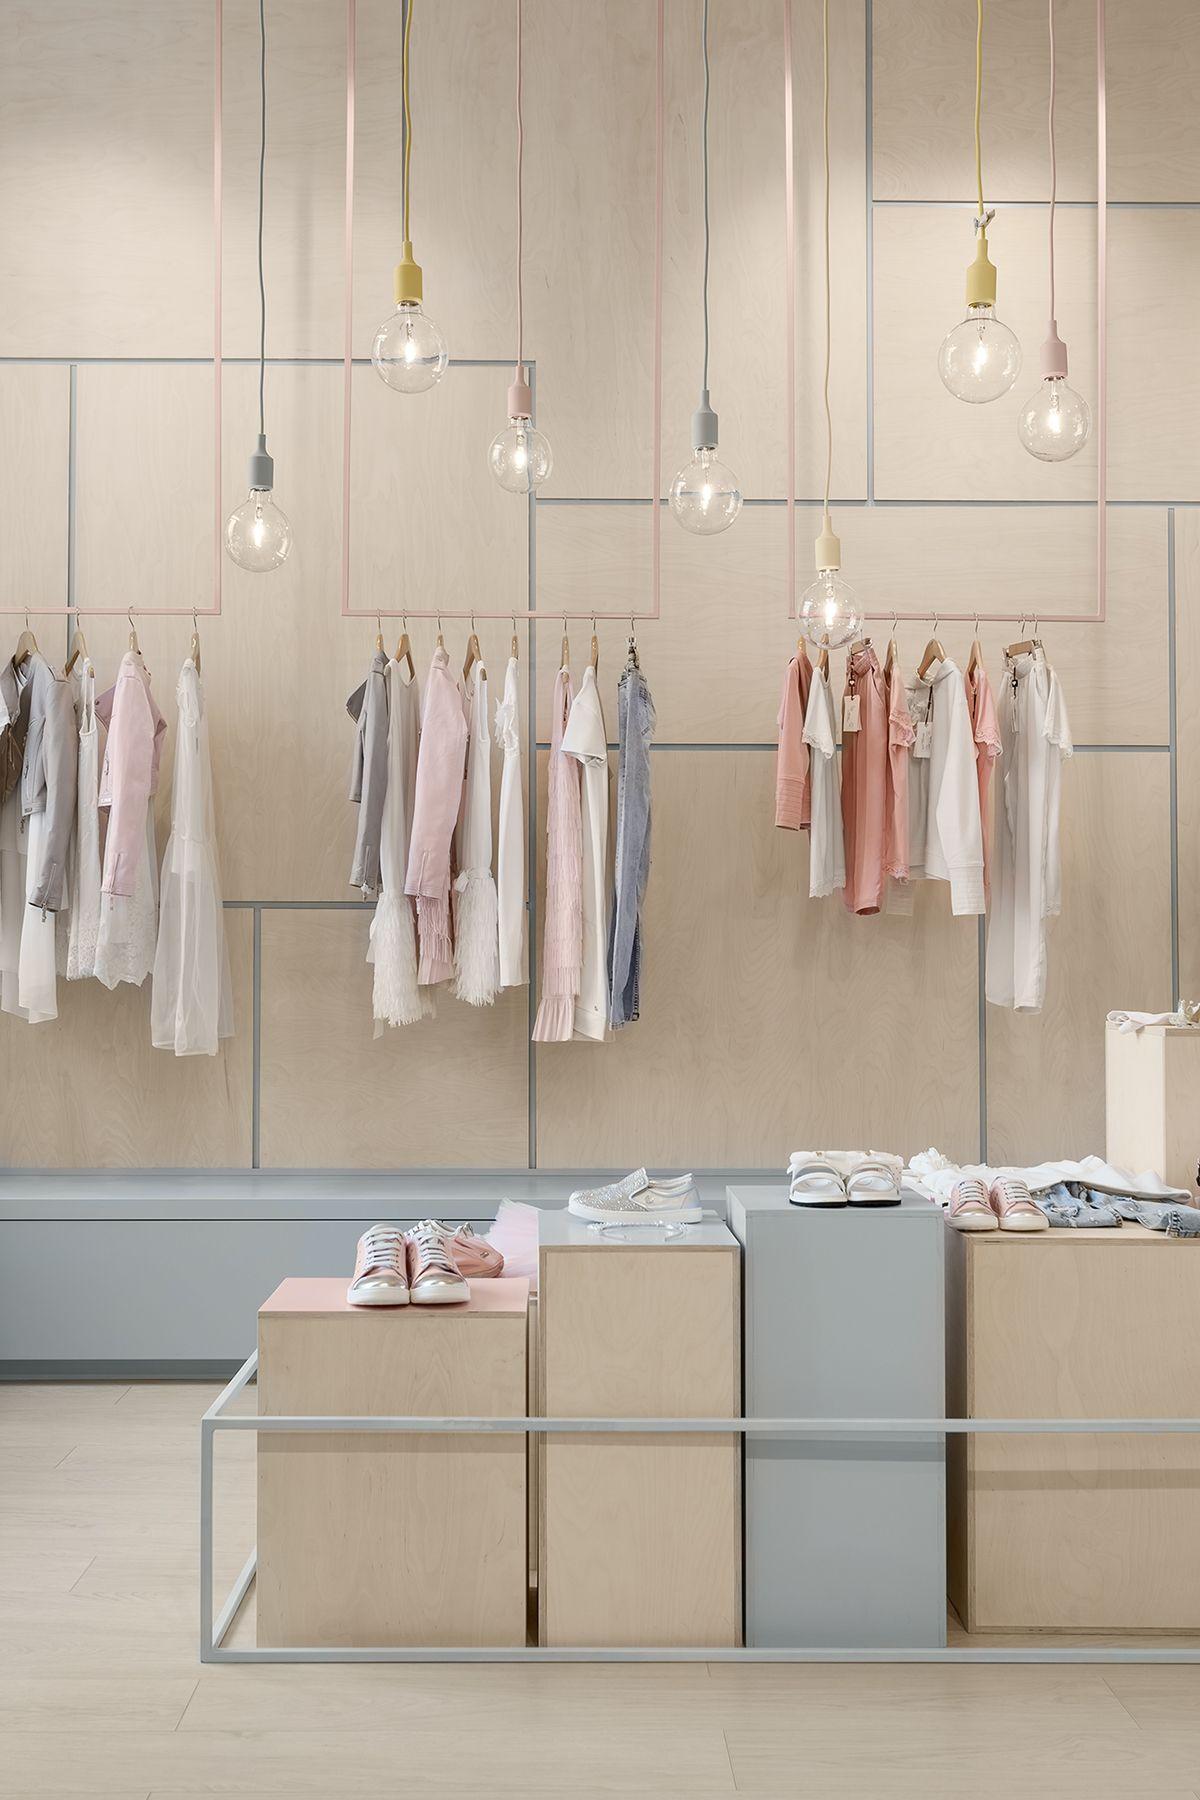 Cabinet Design For Clothes For Kids childrens clothing shop in kyiv, ukraine, designedlena